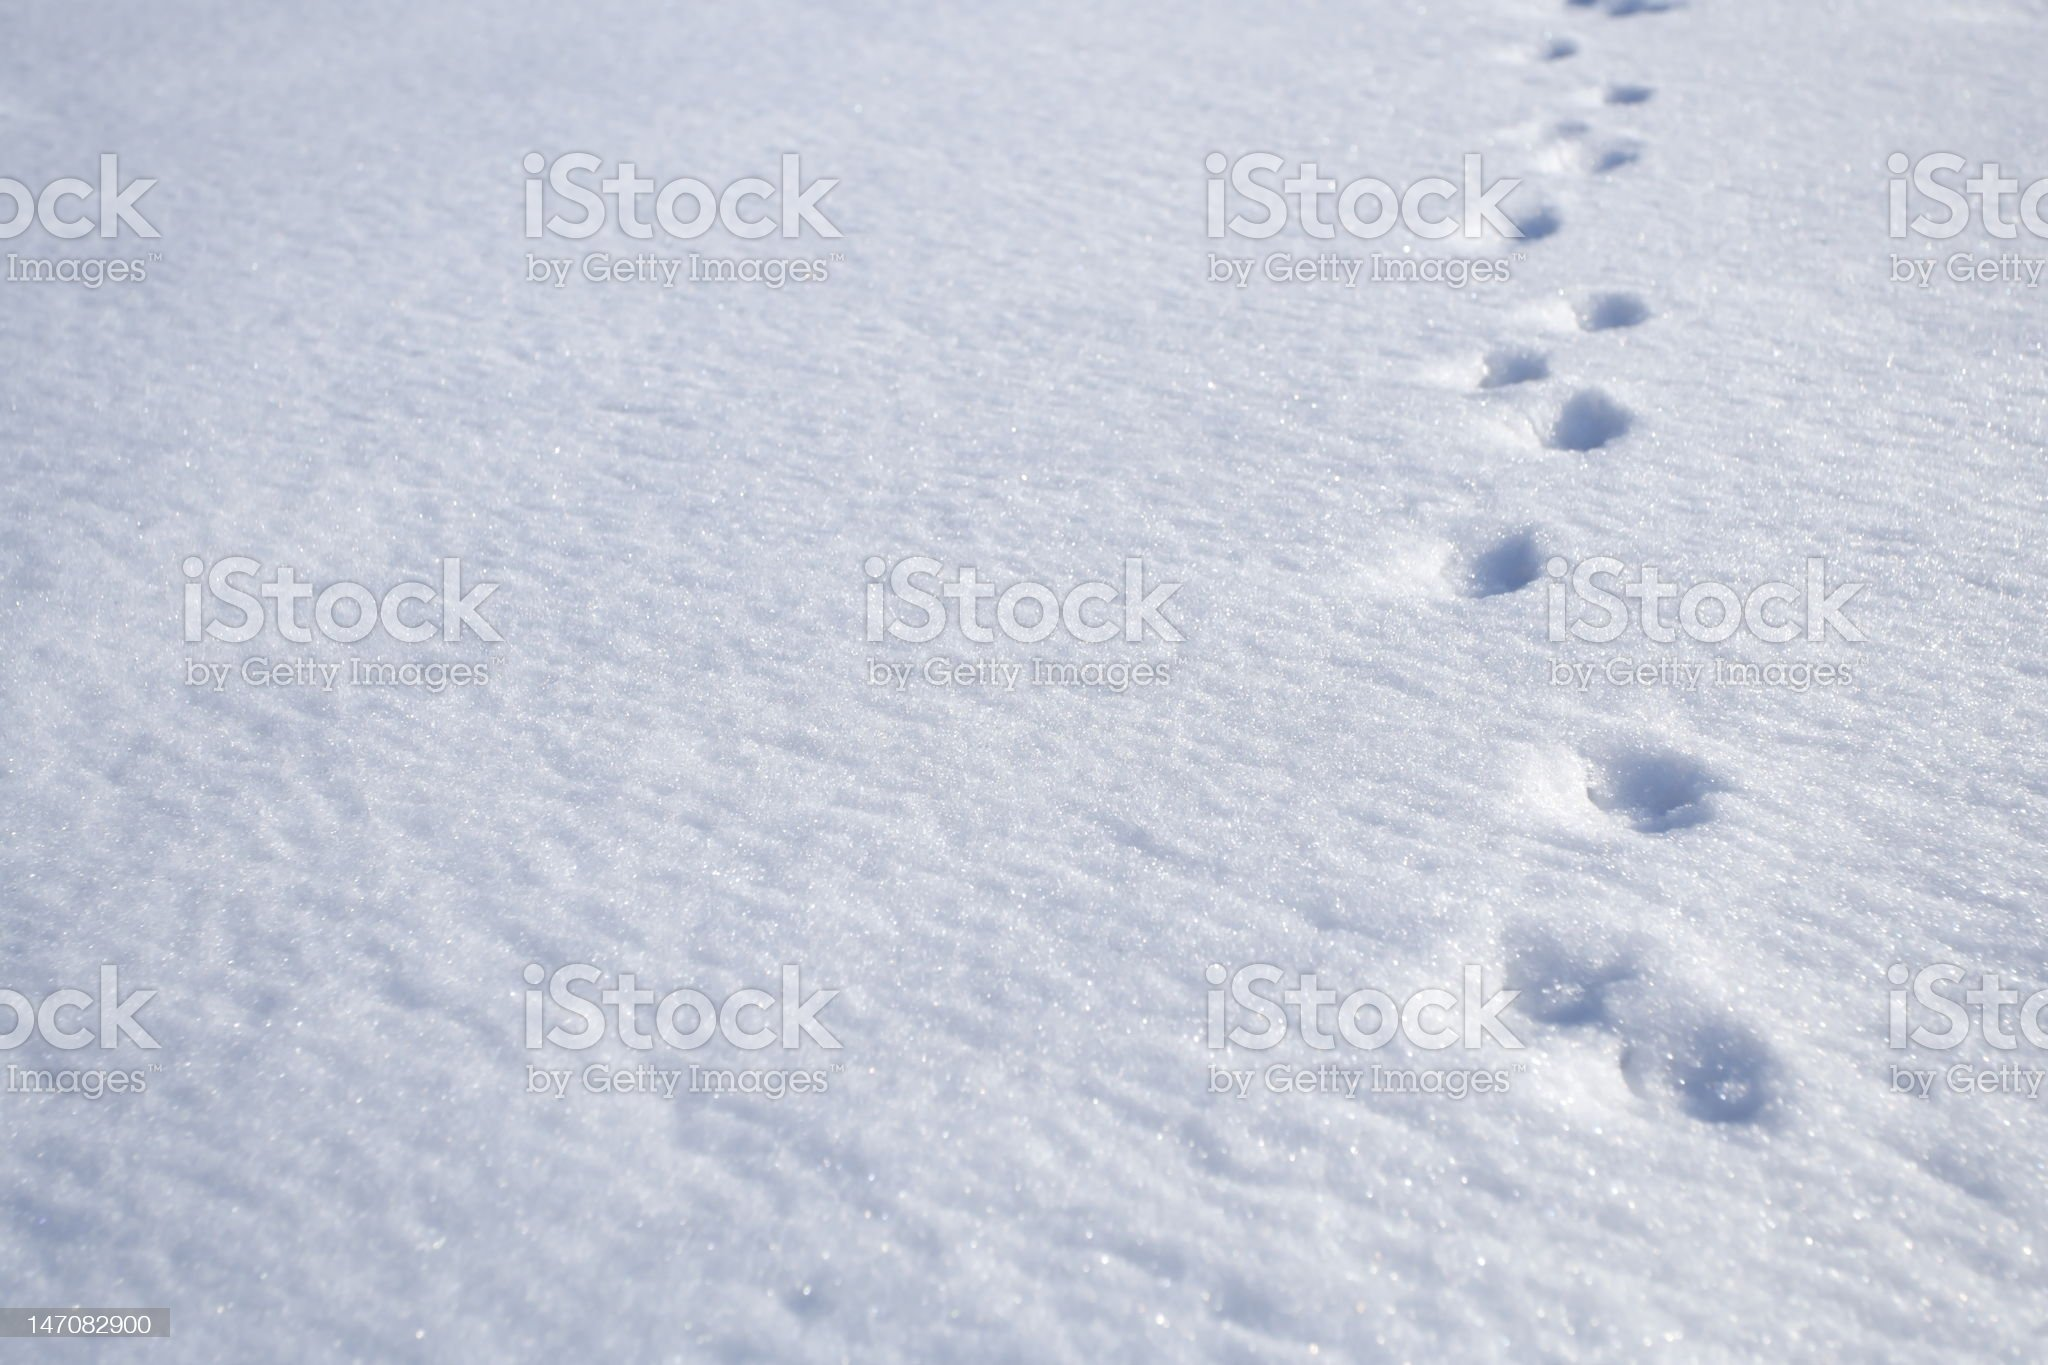 Animal footprints on snow royalty-free stock photo